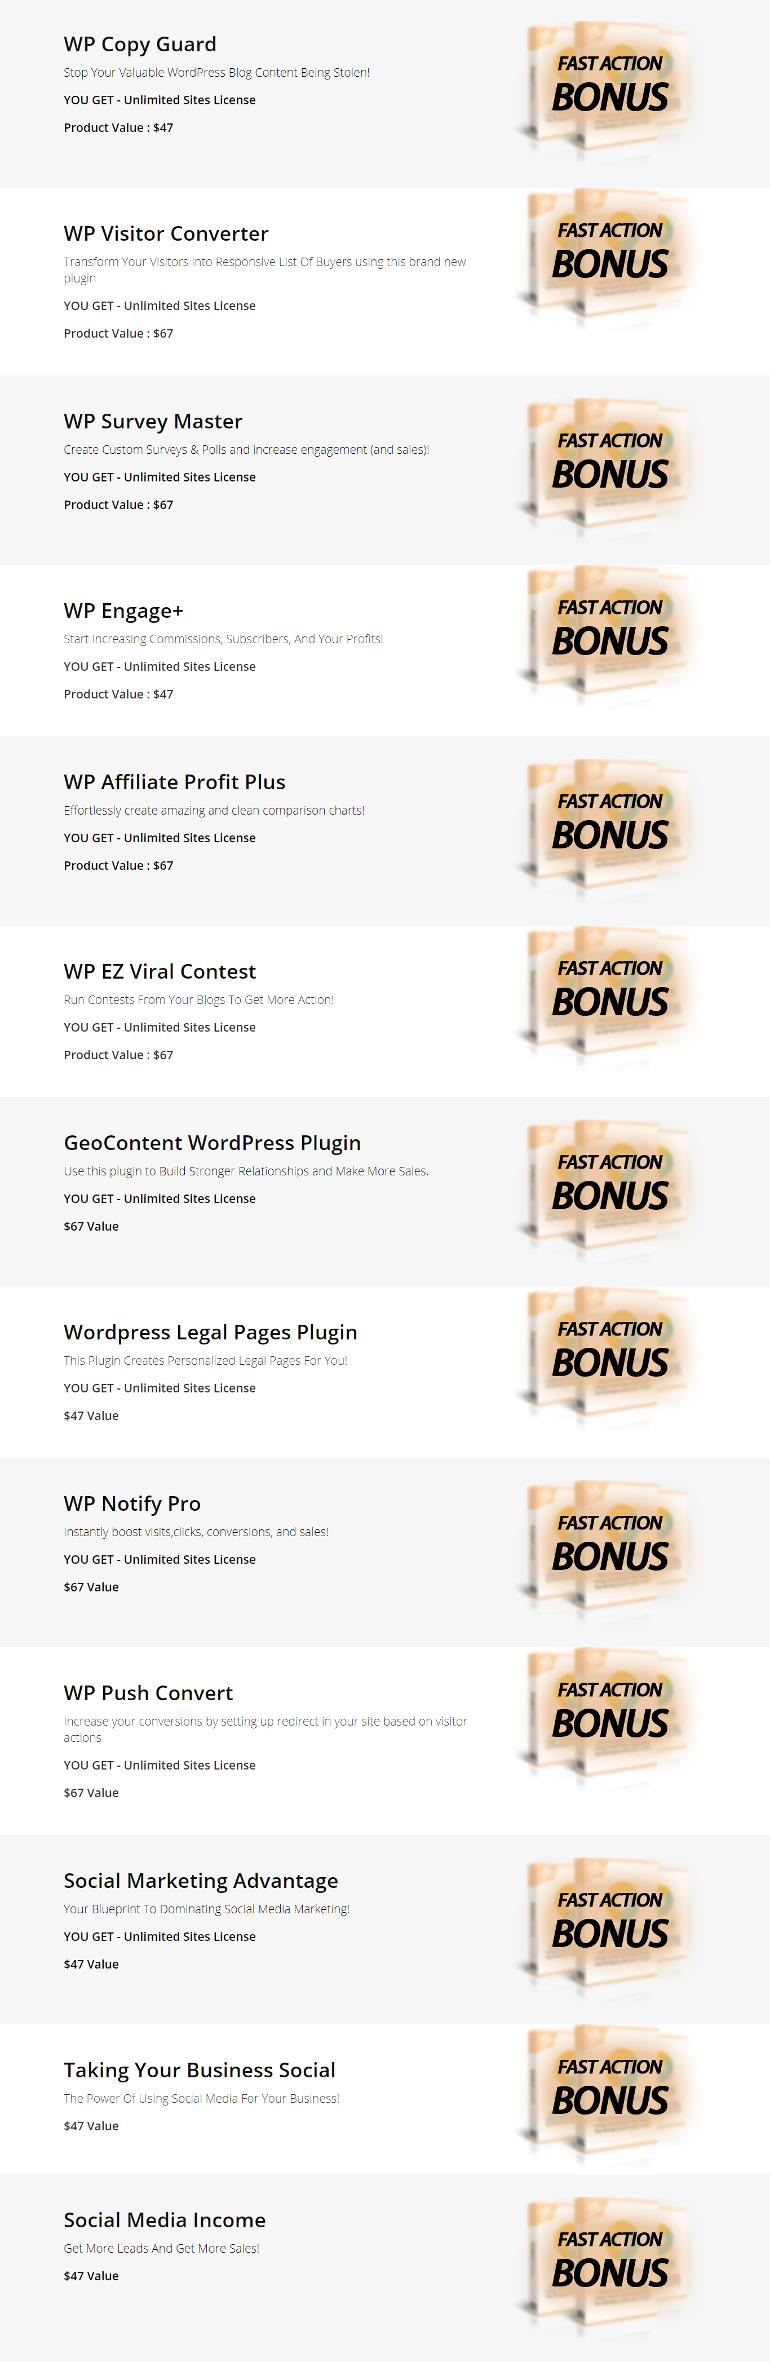 WP Social Contact Bonuses